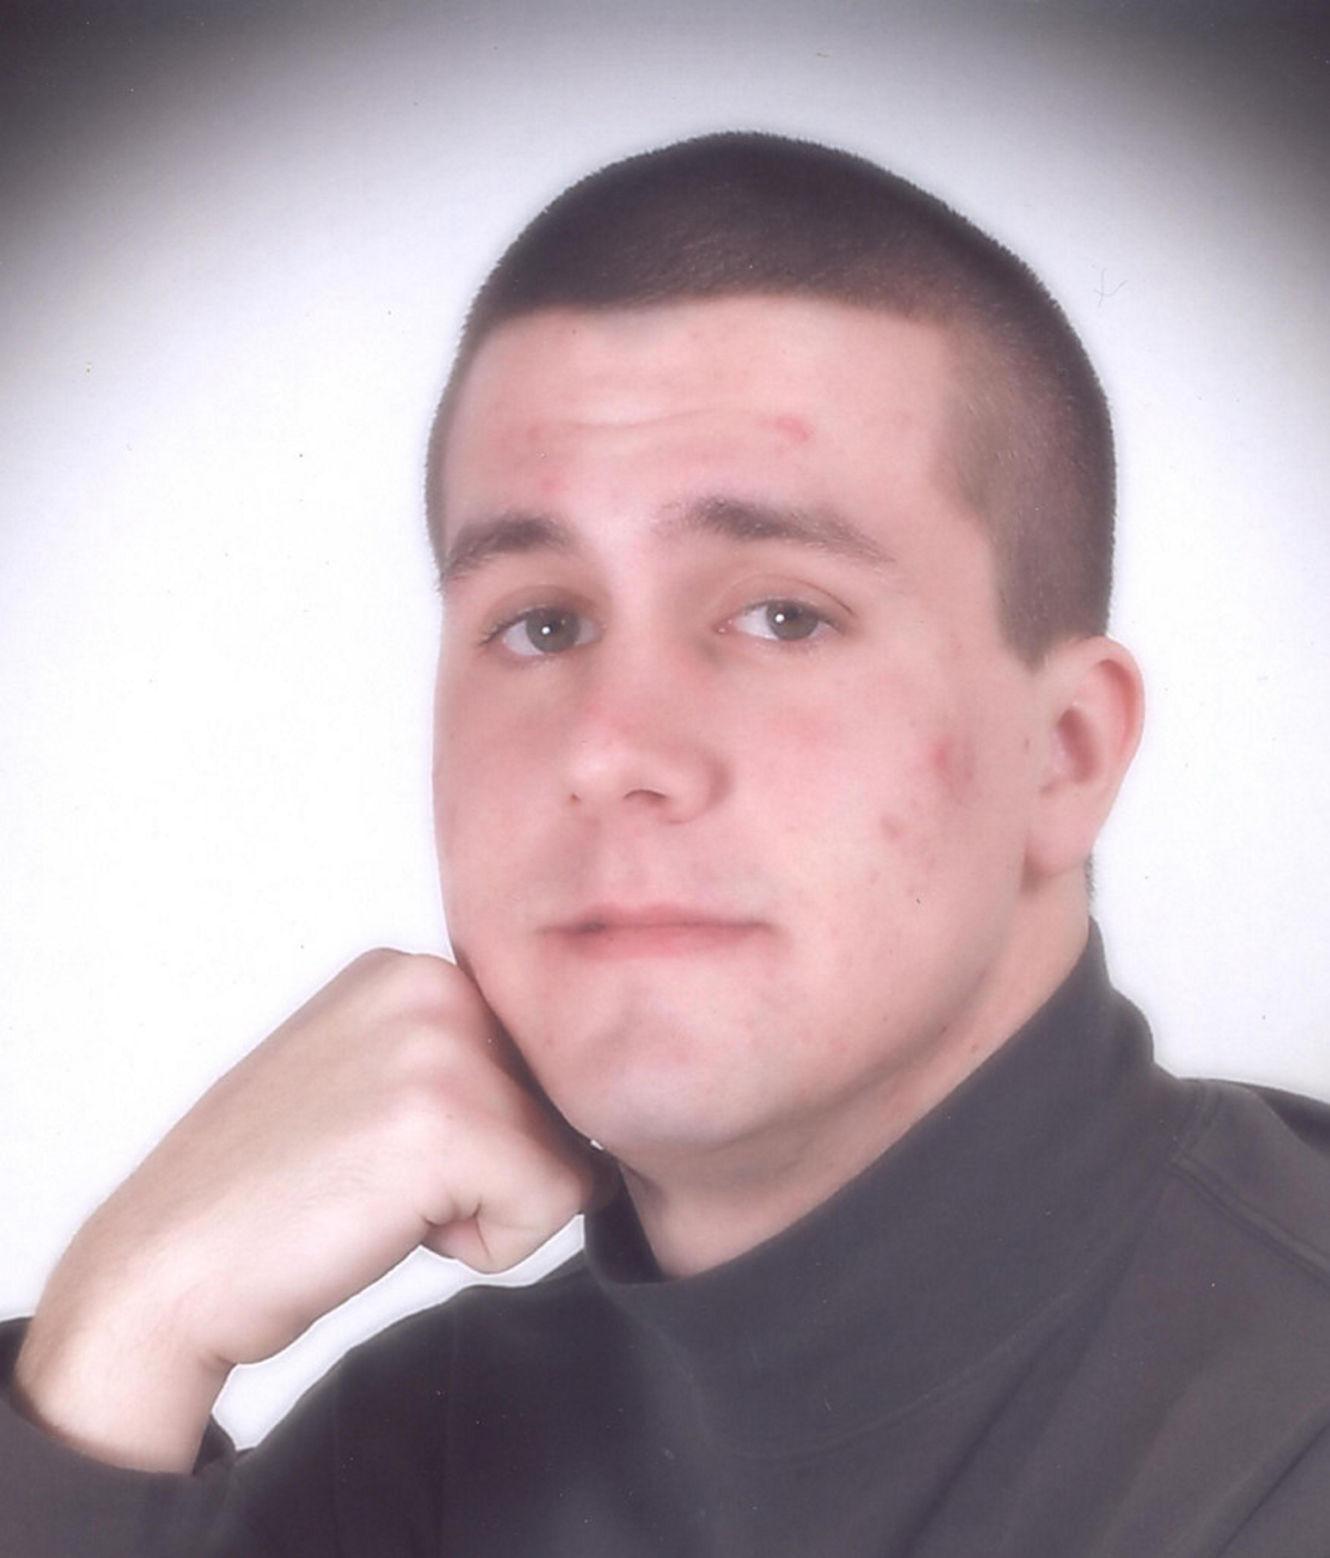 Ryan McGovern